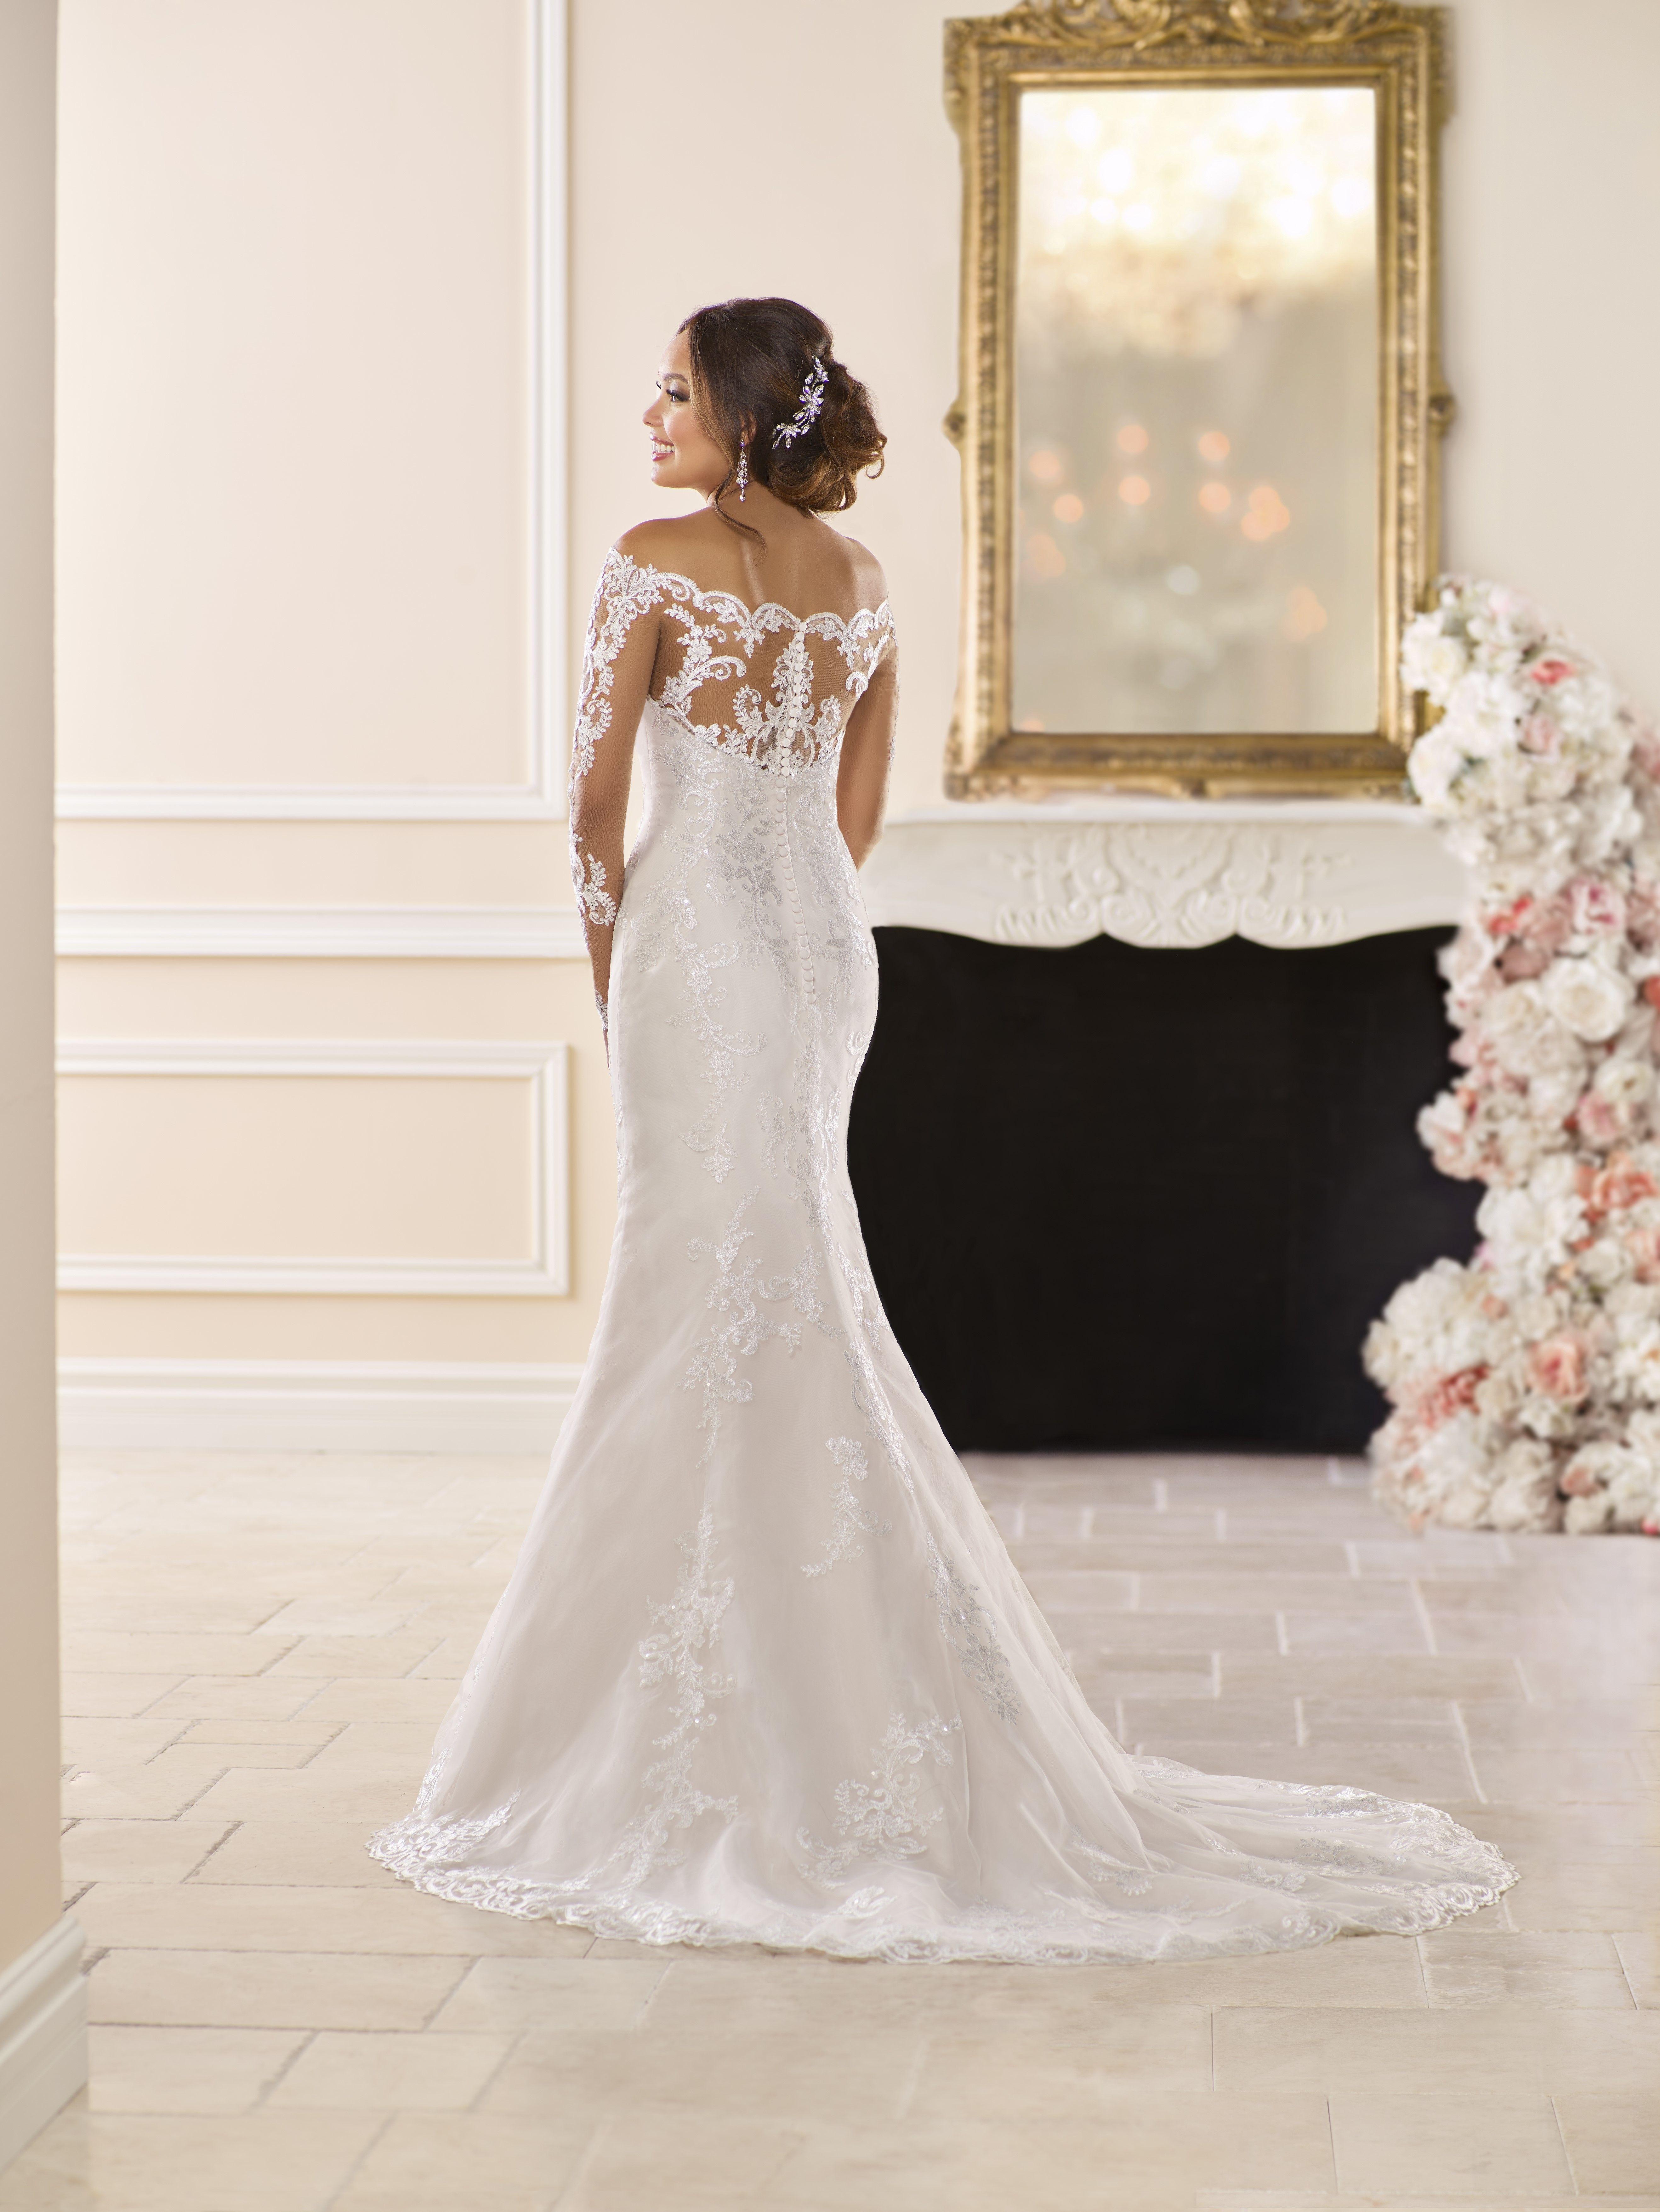 After wedding dress reception  Stella York Wedding Dress Trouwjurk Bruidsjurk Wedding Bruiloft